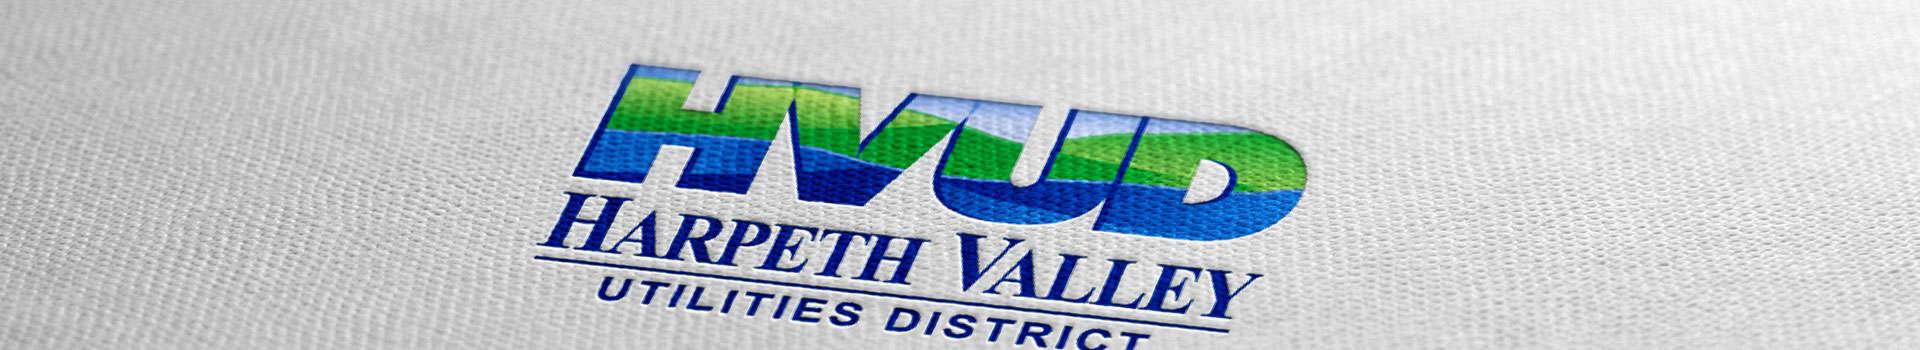 Harpeth Valley Utilities District Portfolio